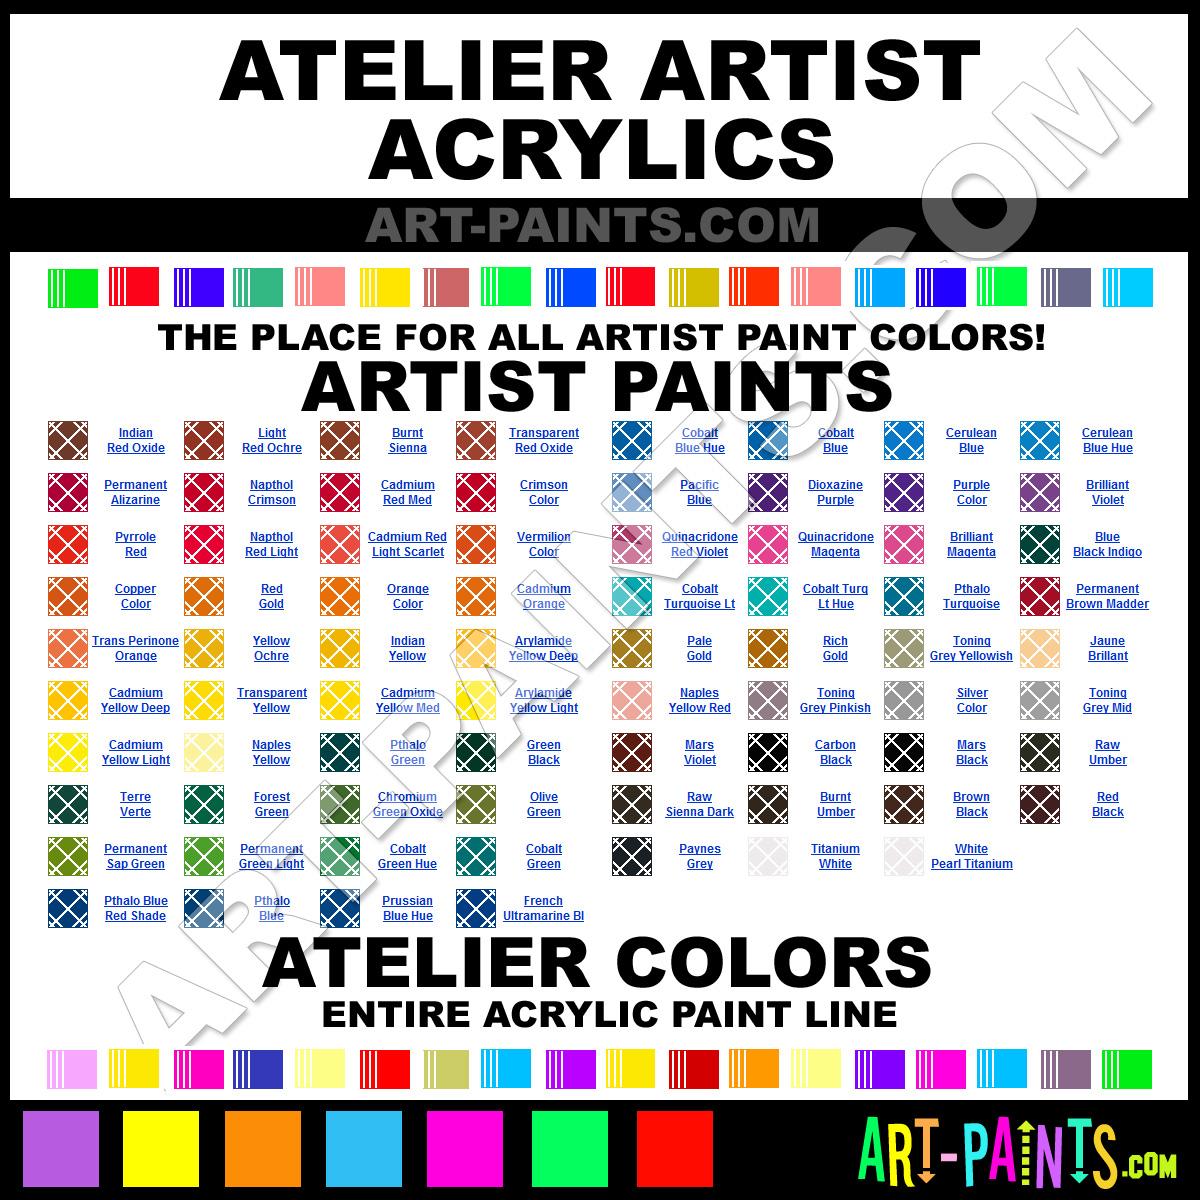 Toning grey pinkish artist acrylic paints 0691 toning for Chroma acrylic mural paint